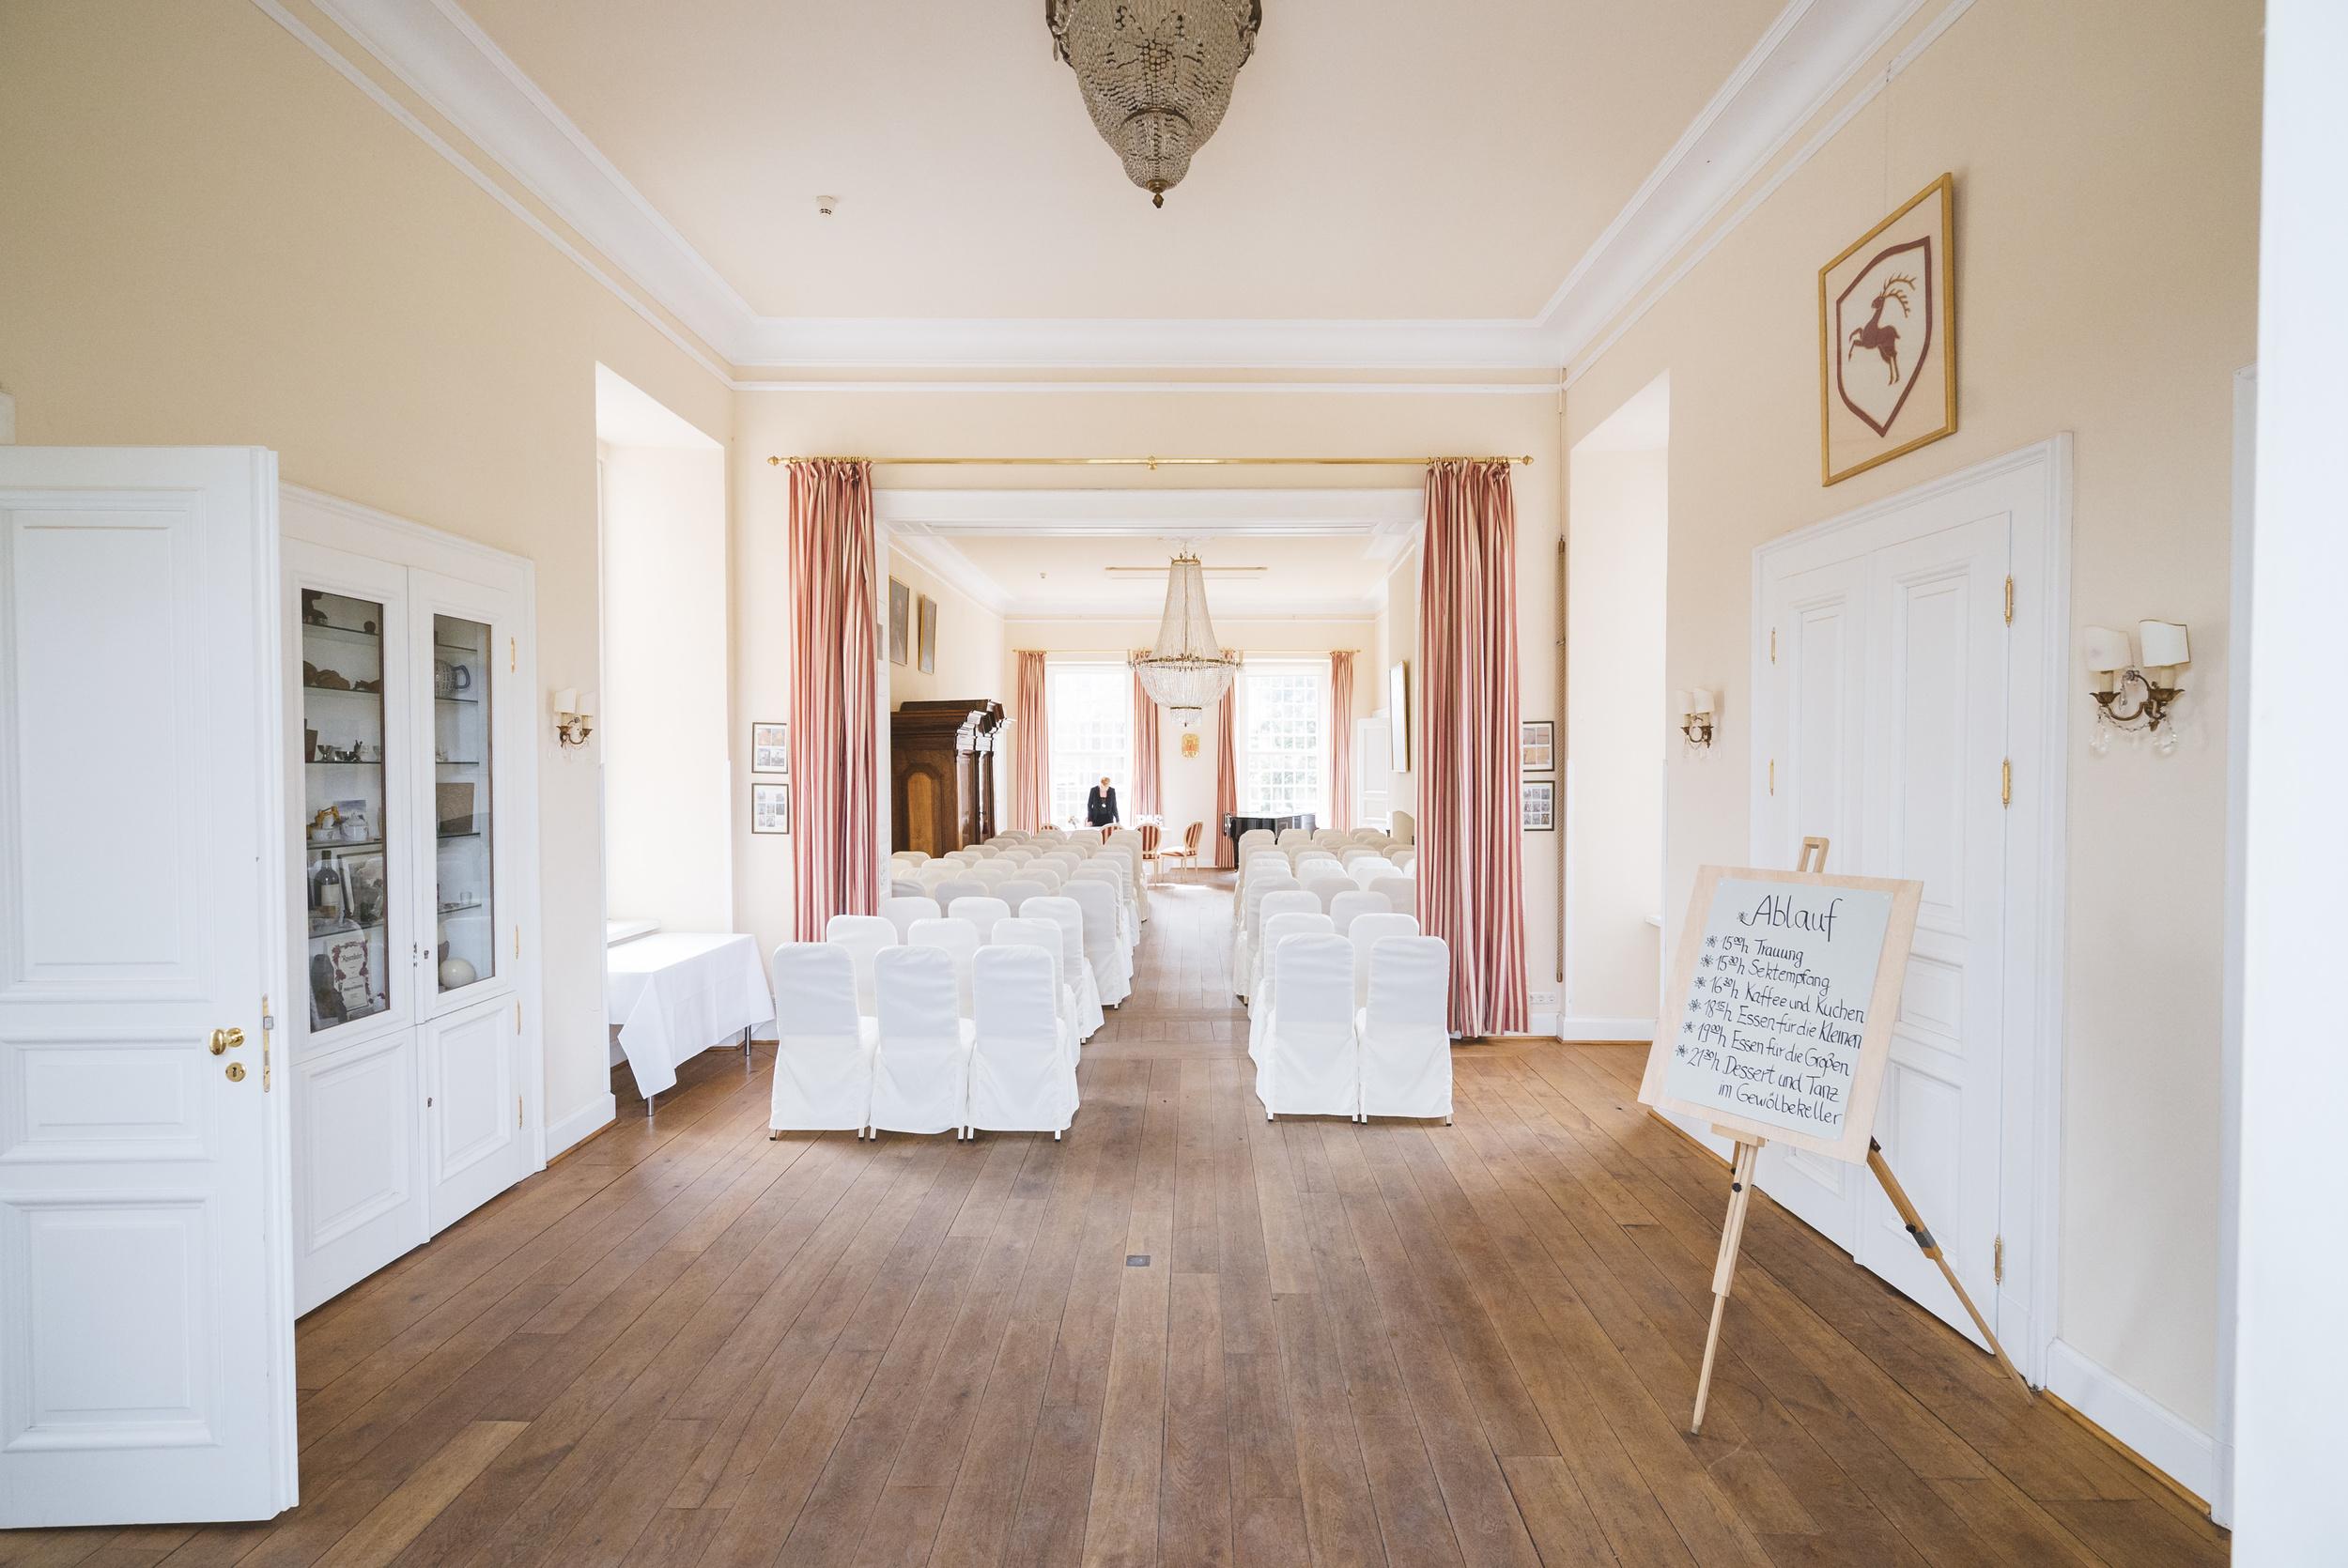 Hochzeitsfotograf-Schlossruine-Hertefeld-Weeze-058.jpg